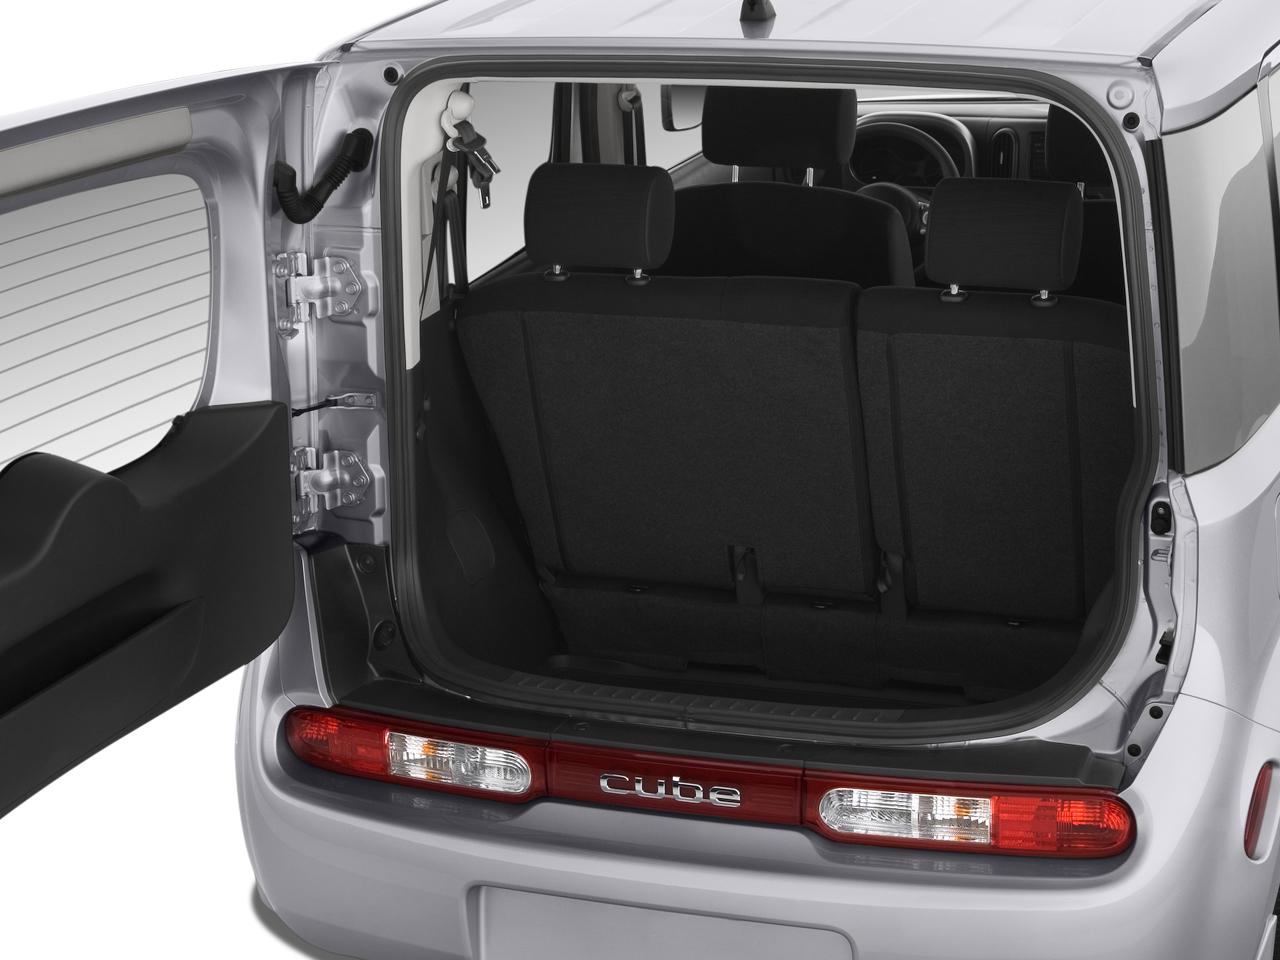 2009 Nissan Cube Krom Nissan Midsize Suv Review Automobile Magazine